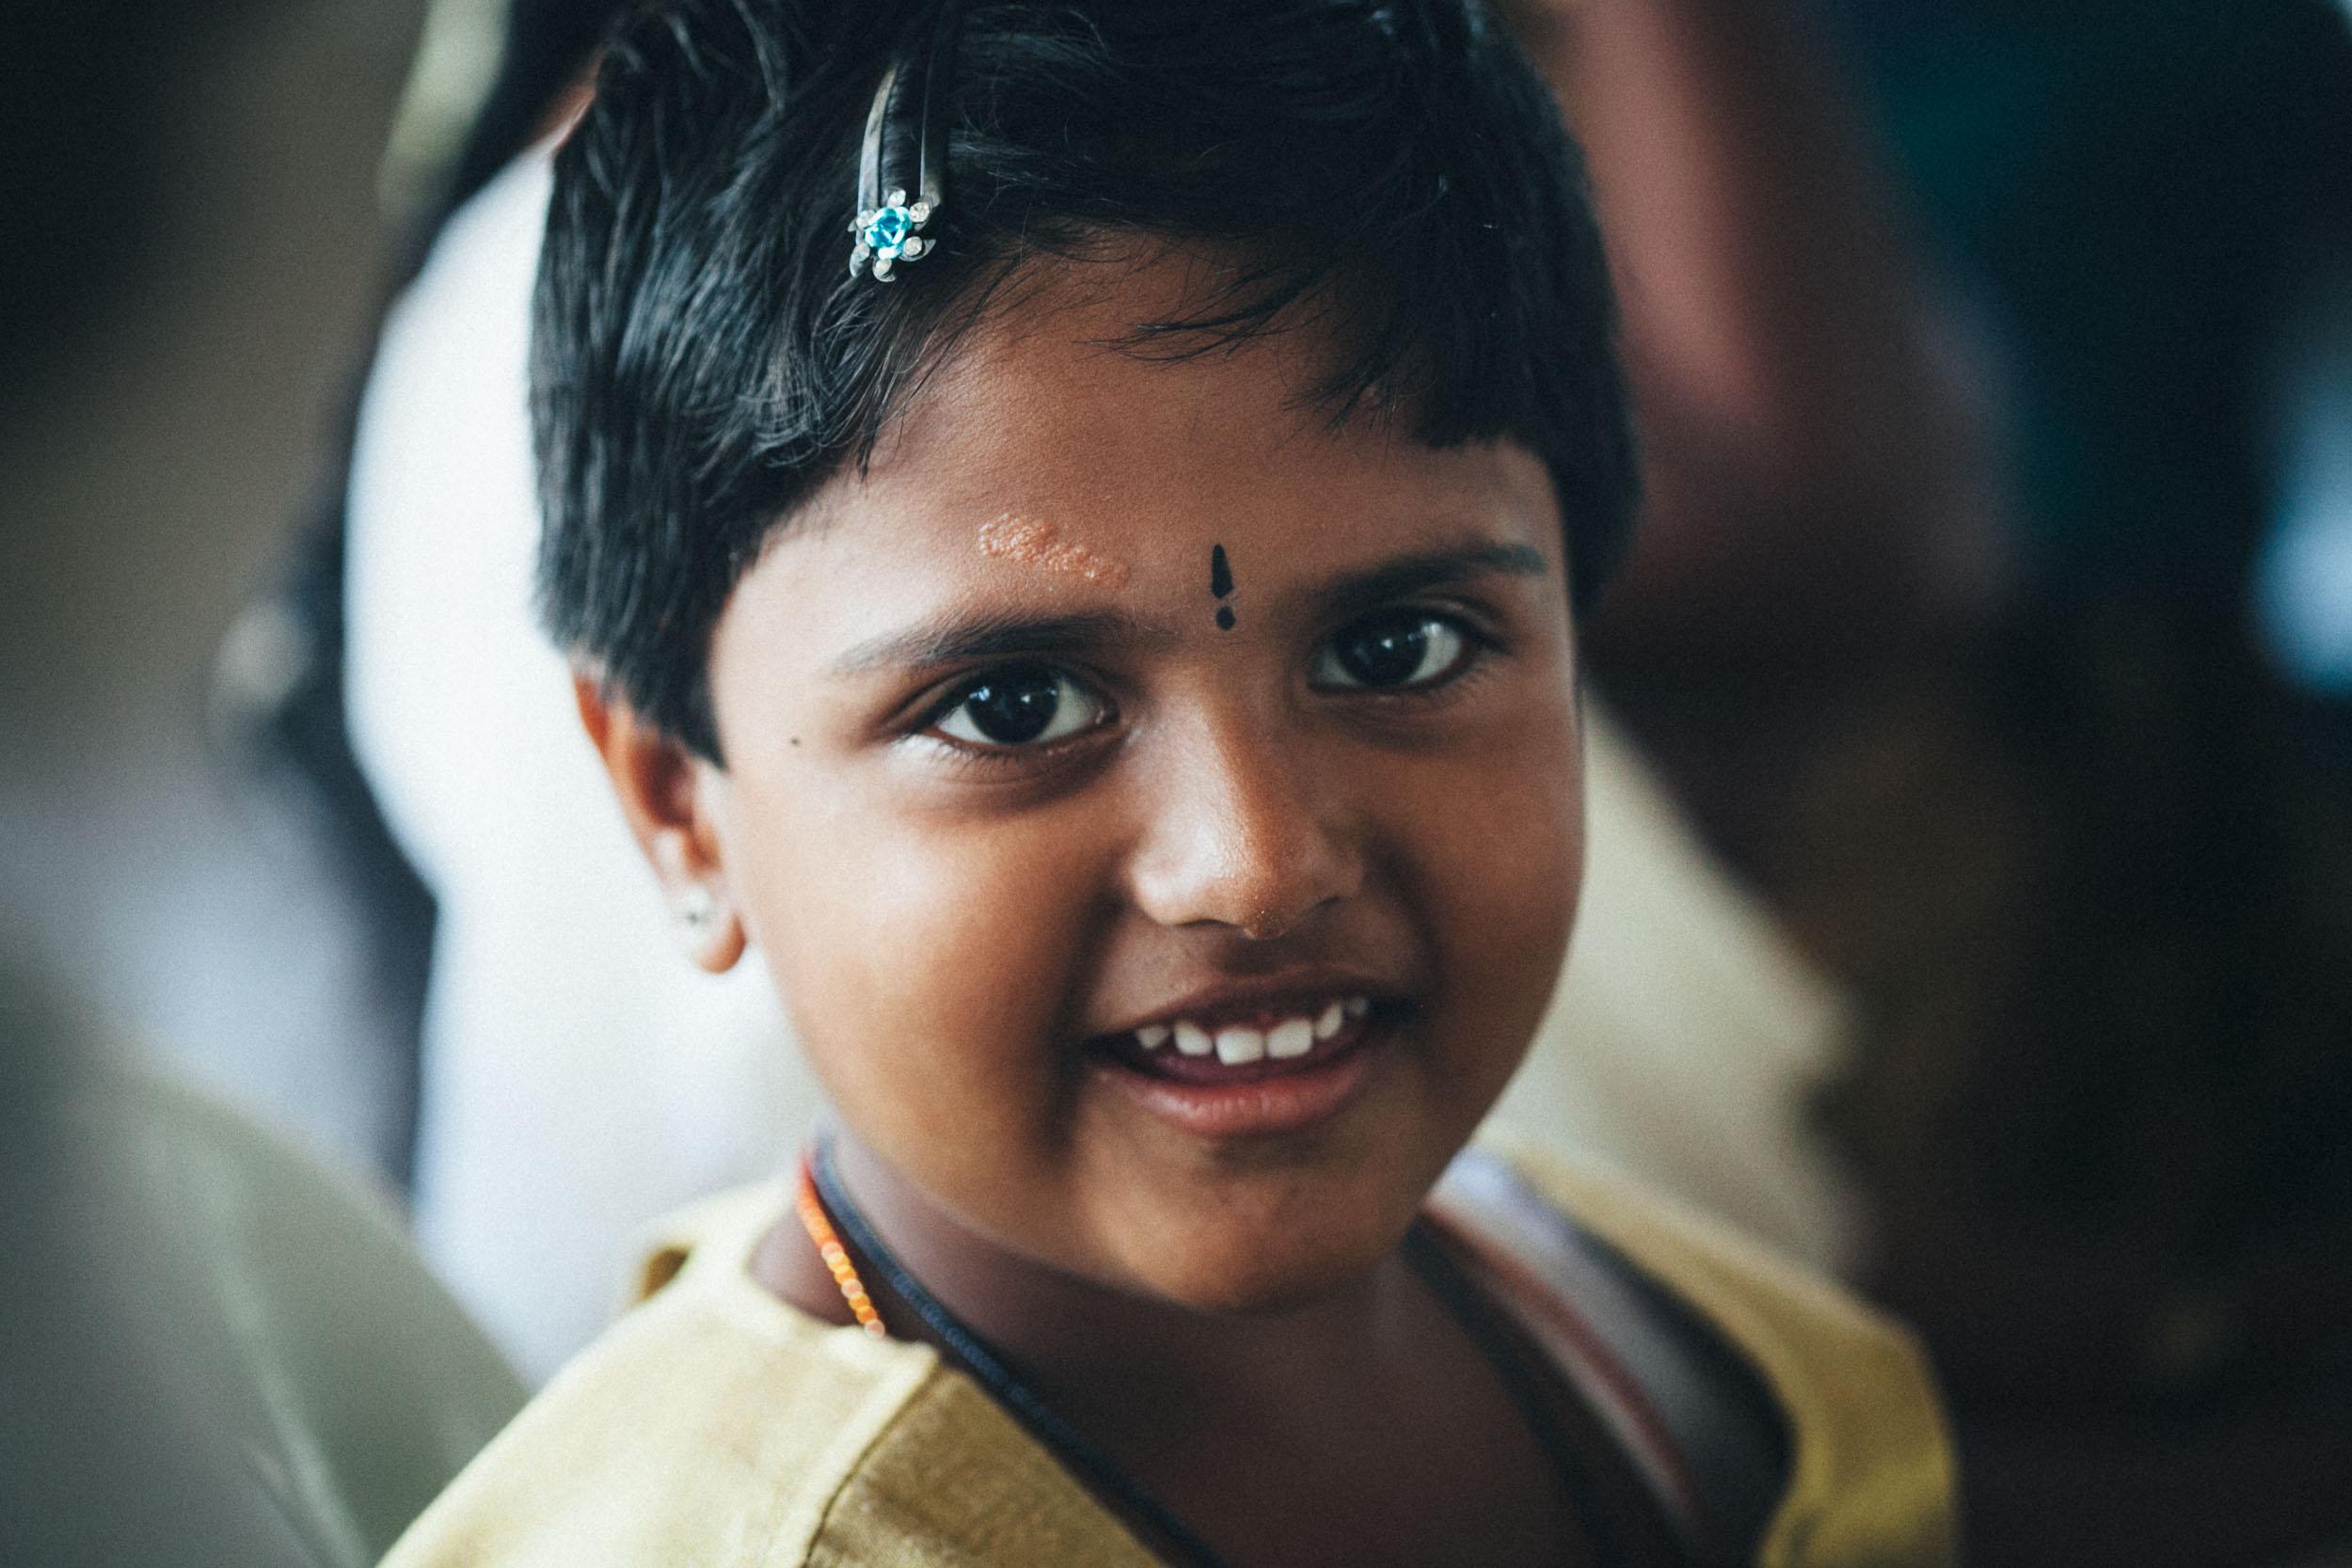 brian-callaway-india-photography-aravind-eye-hospital-18.jpg